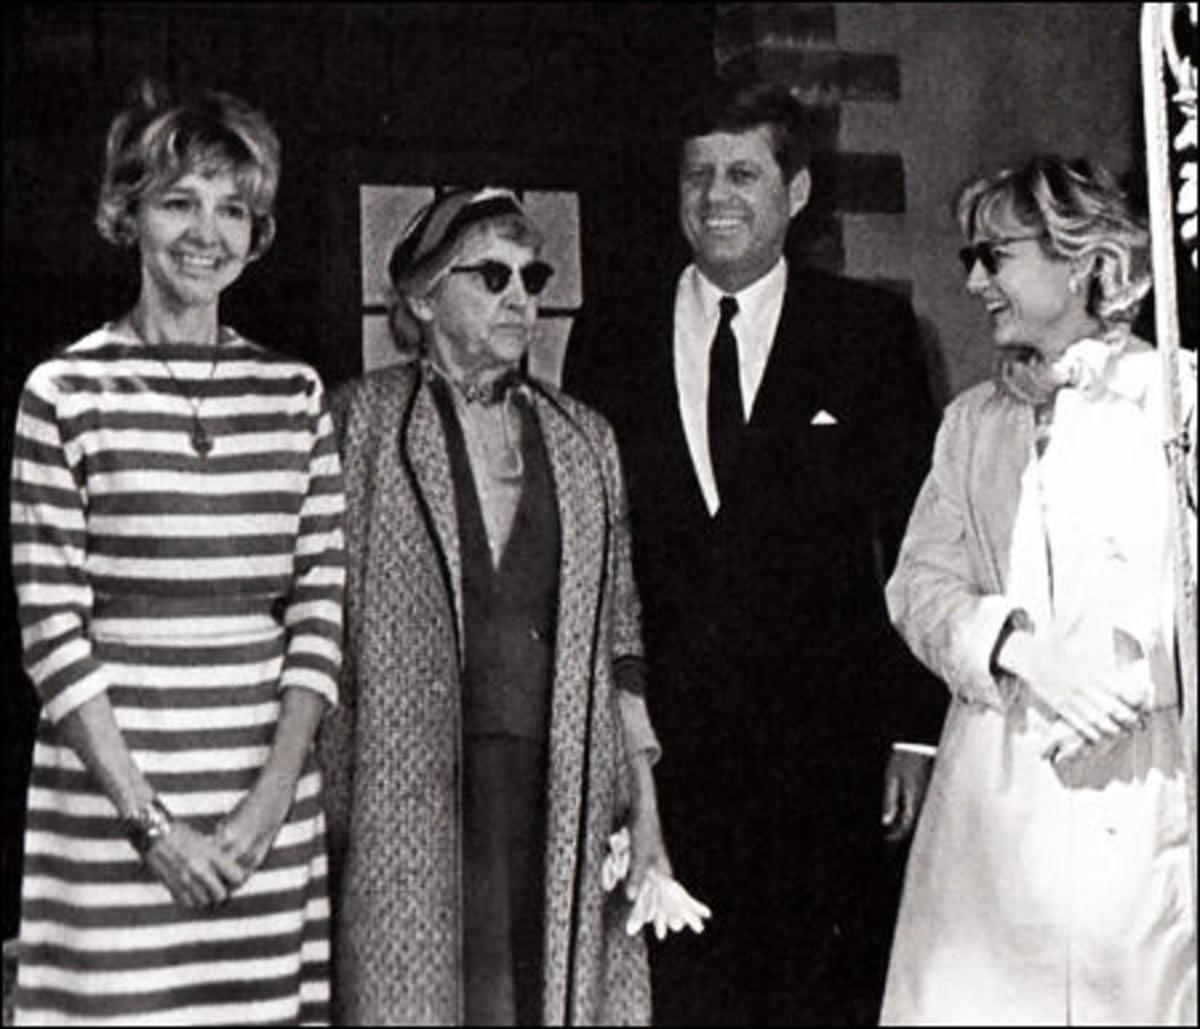 Mary far right) and Jack.